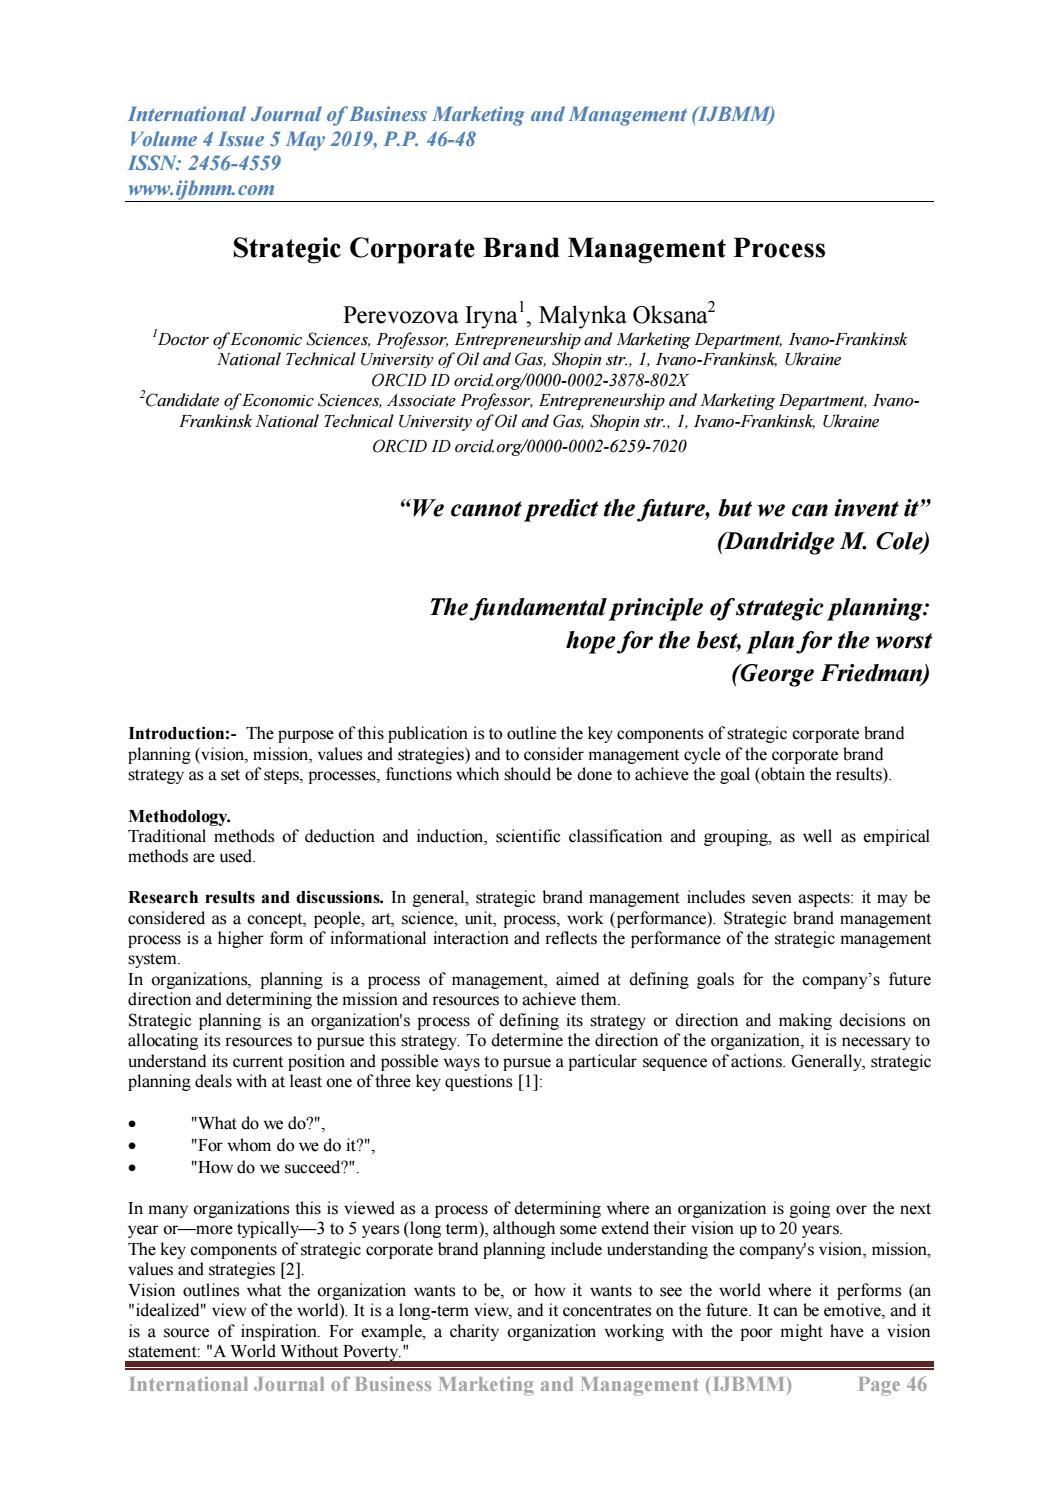 Strategic Corporate Brand Management Process By Ijbmm Journal Issuu